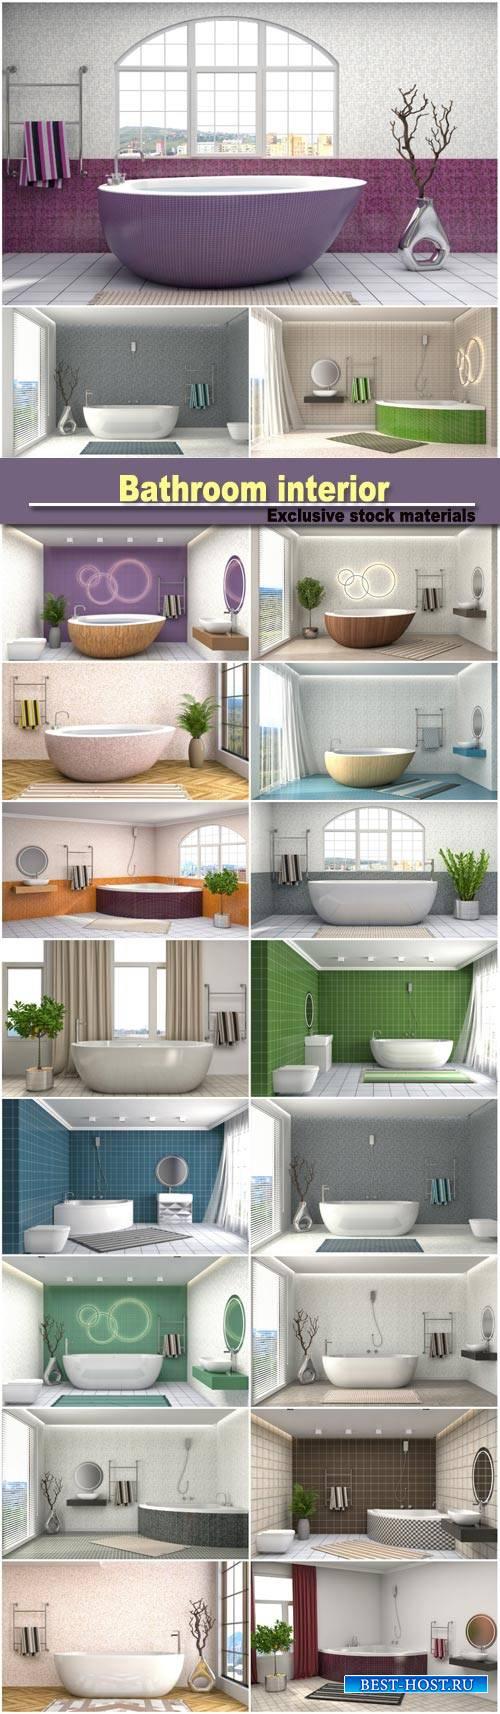 Bathroom interior, 3D illustration